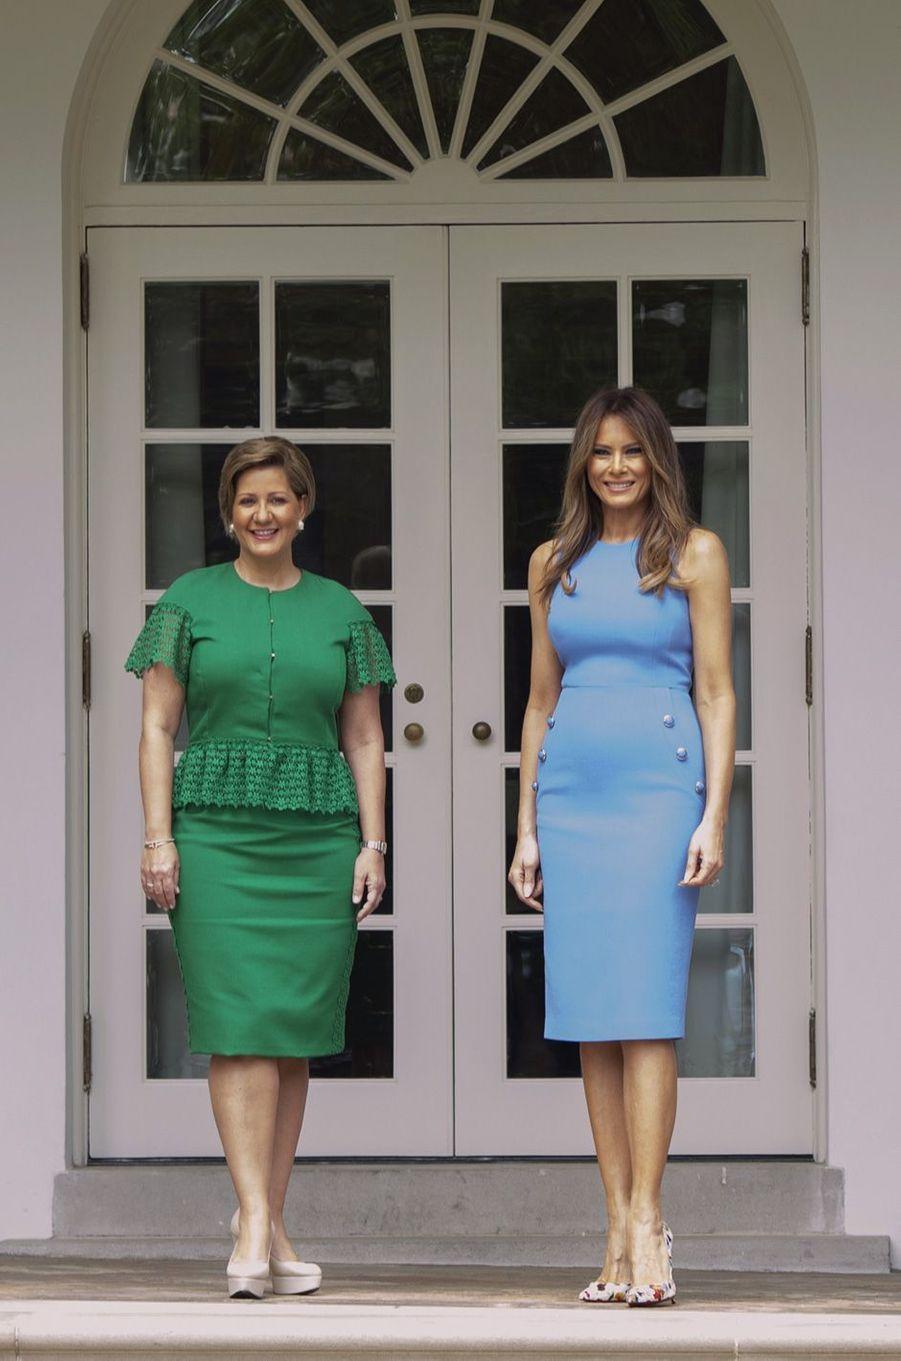 Lorena Castillo de Varela et Melania Trumpà la Maison Blanche, le 19 juin 2017.